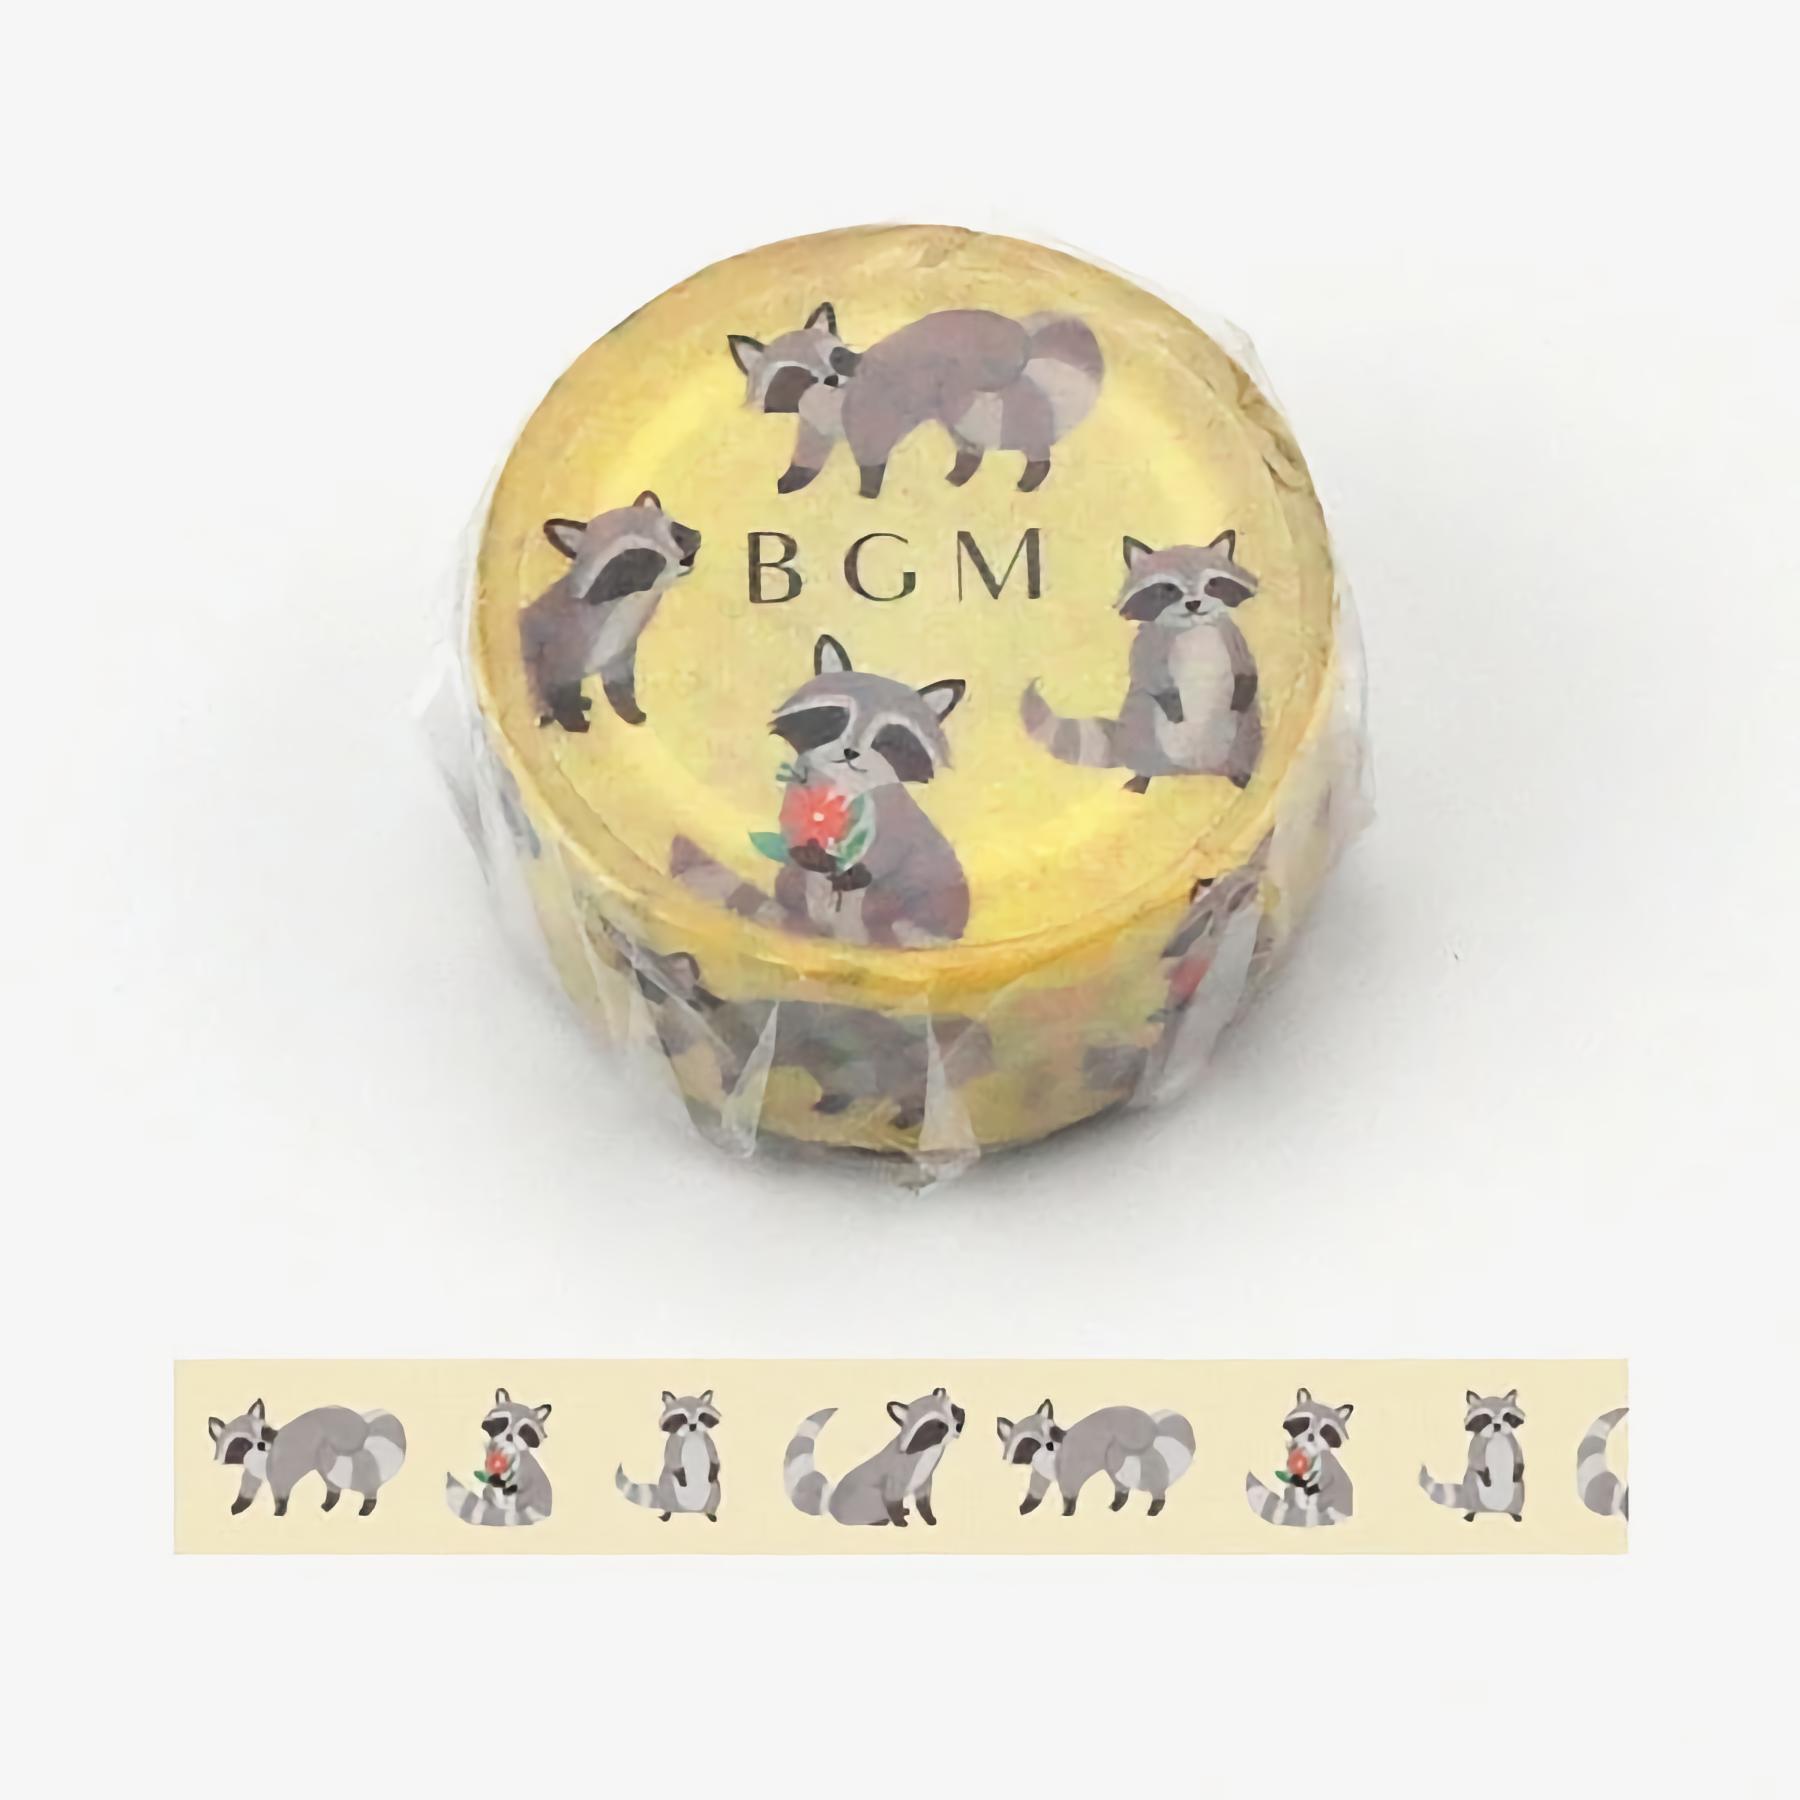 BGM Washi Tape Racoon 15 mm